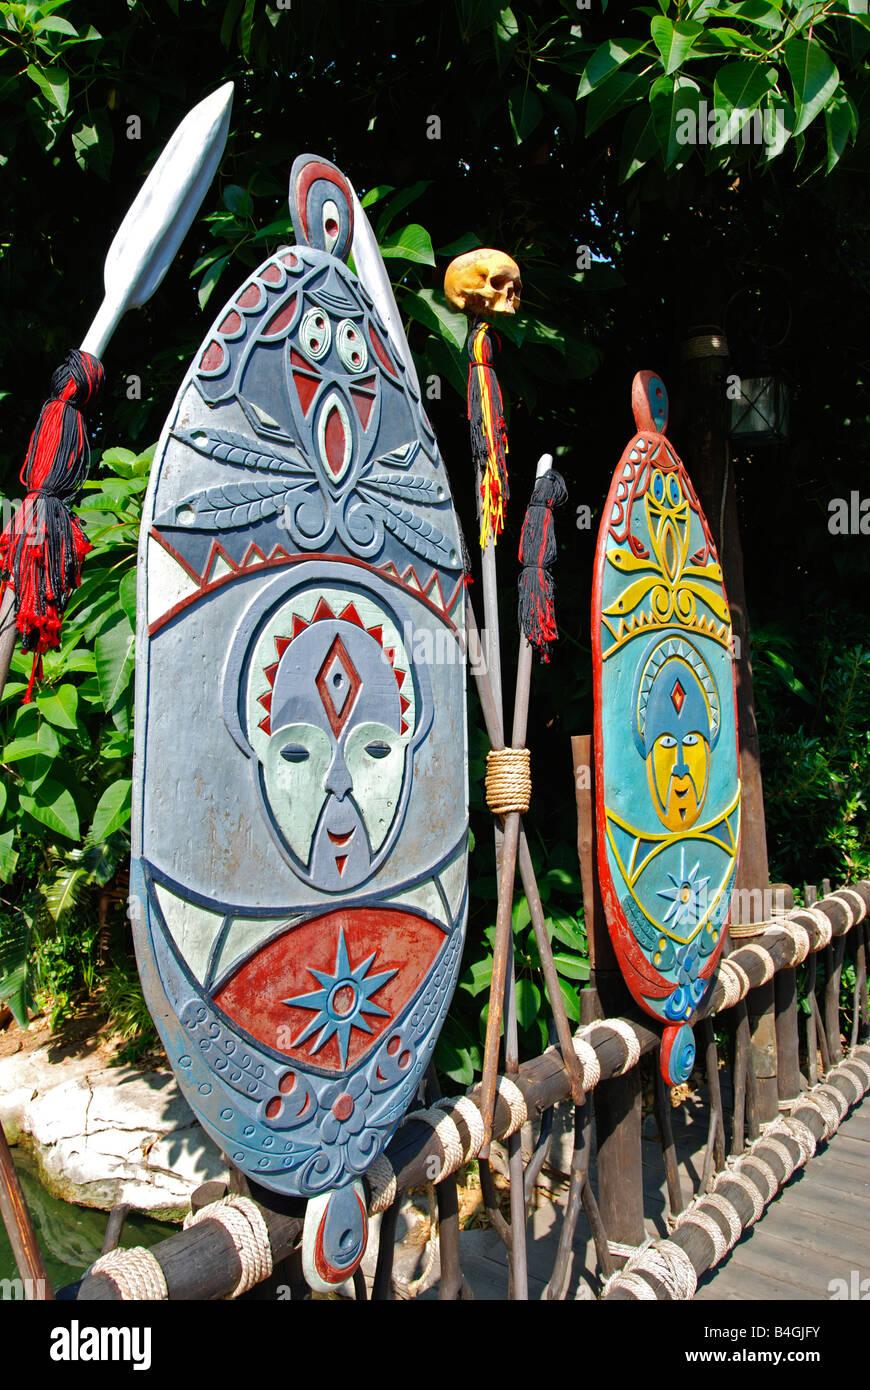 polynesian  shields at portaventura theme park in salou, spain - Stock Image